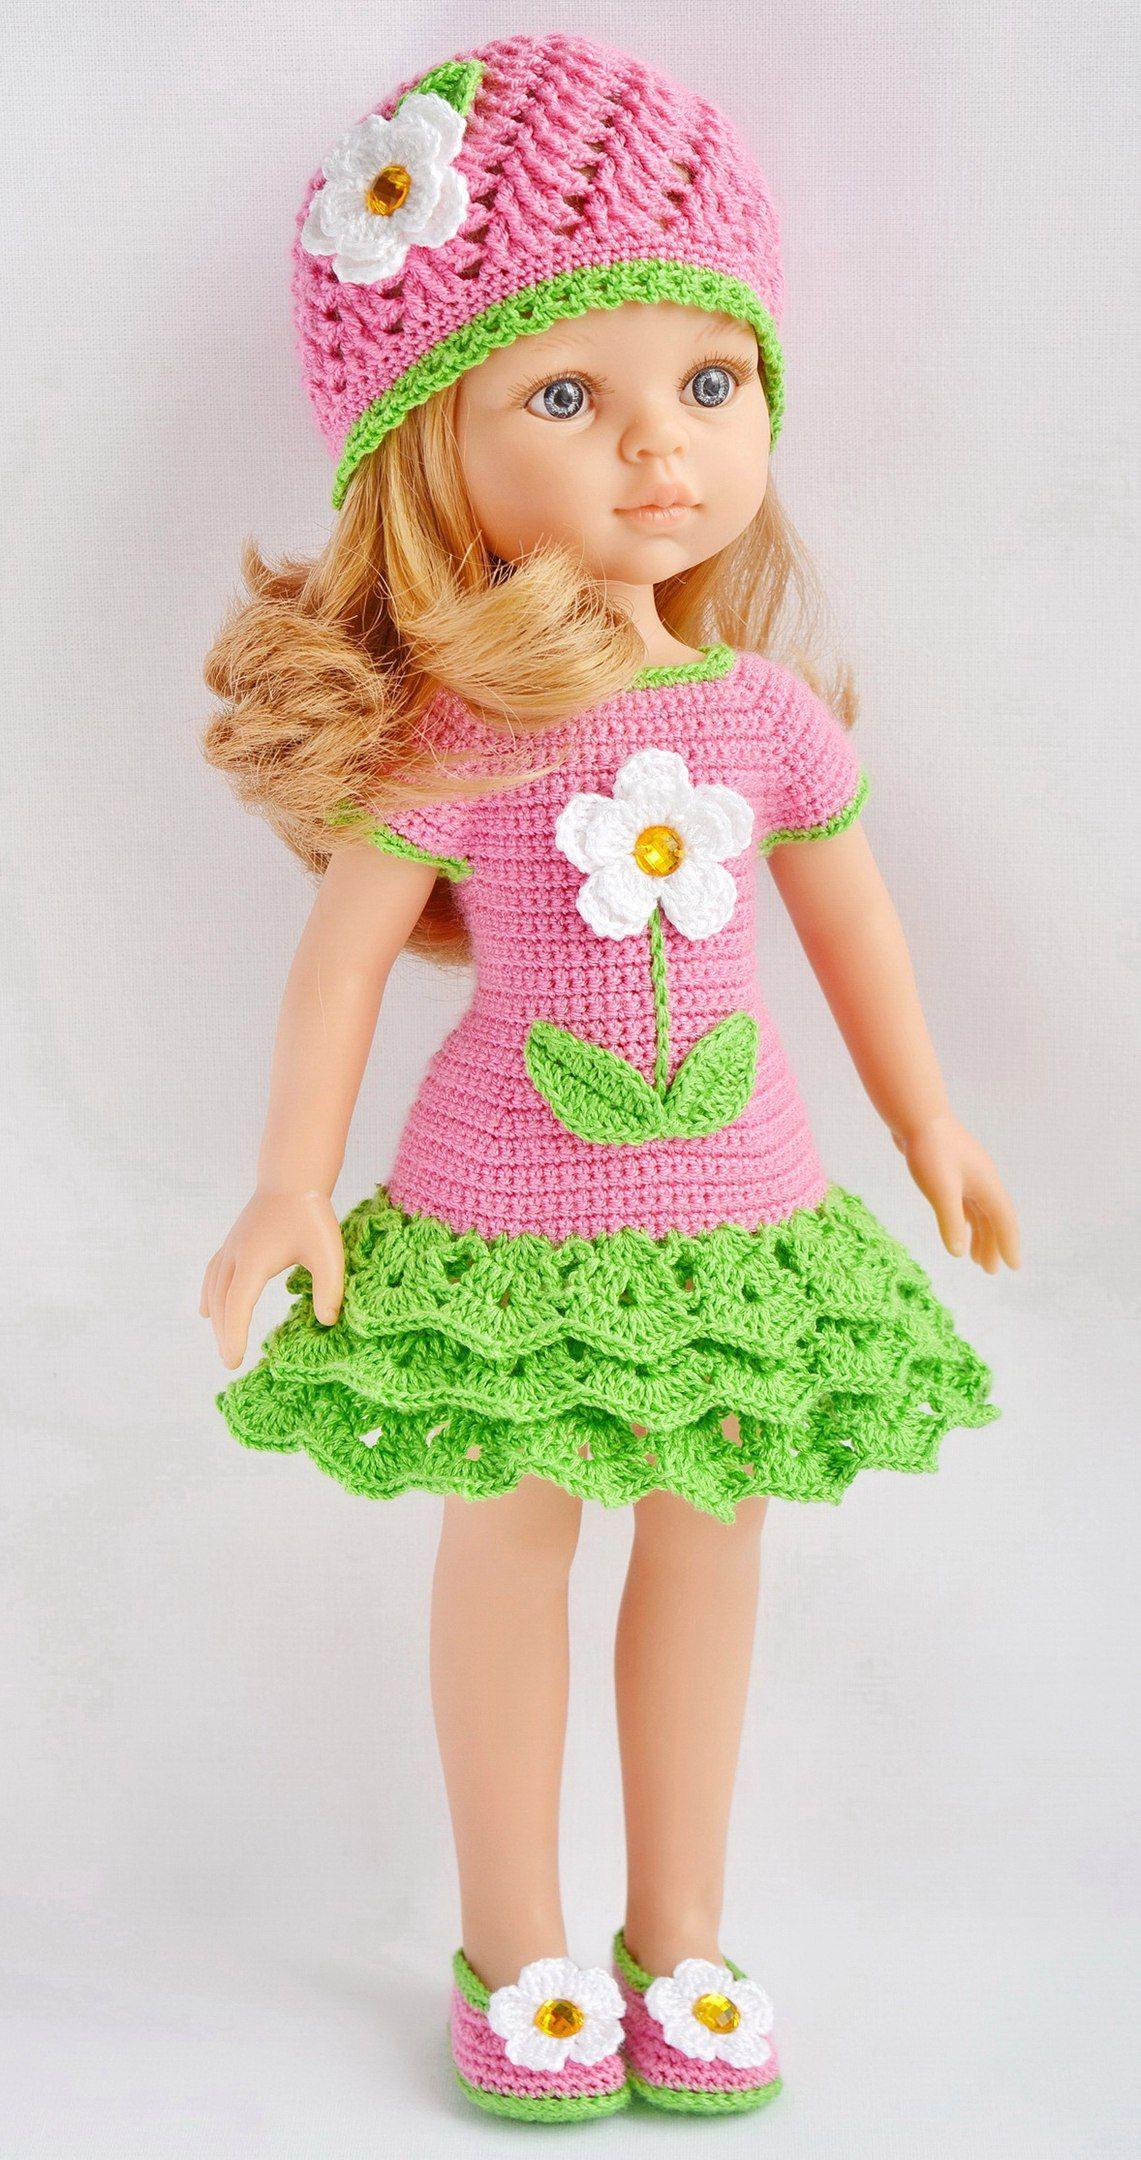 Испанские куклы Paola Reina | VK | Maria Otero | Pinterest | Muñecas ...